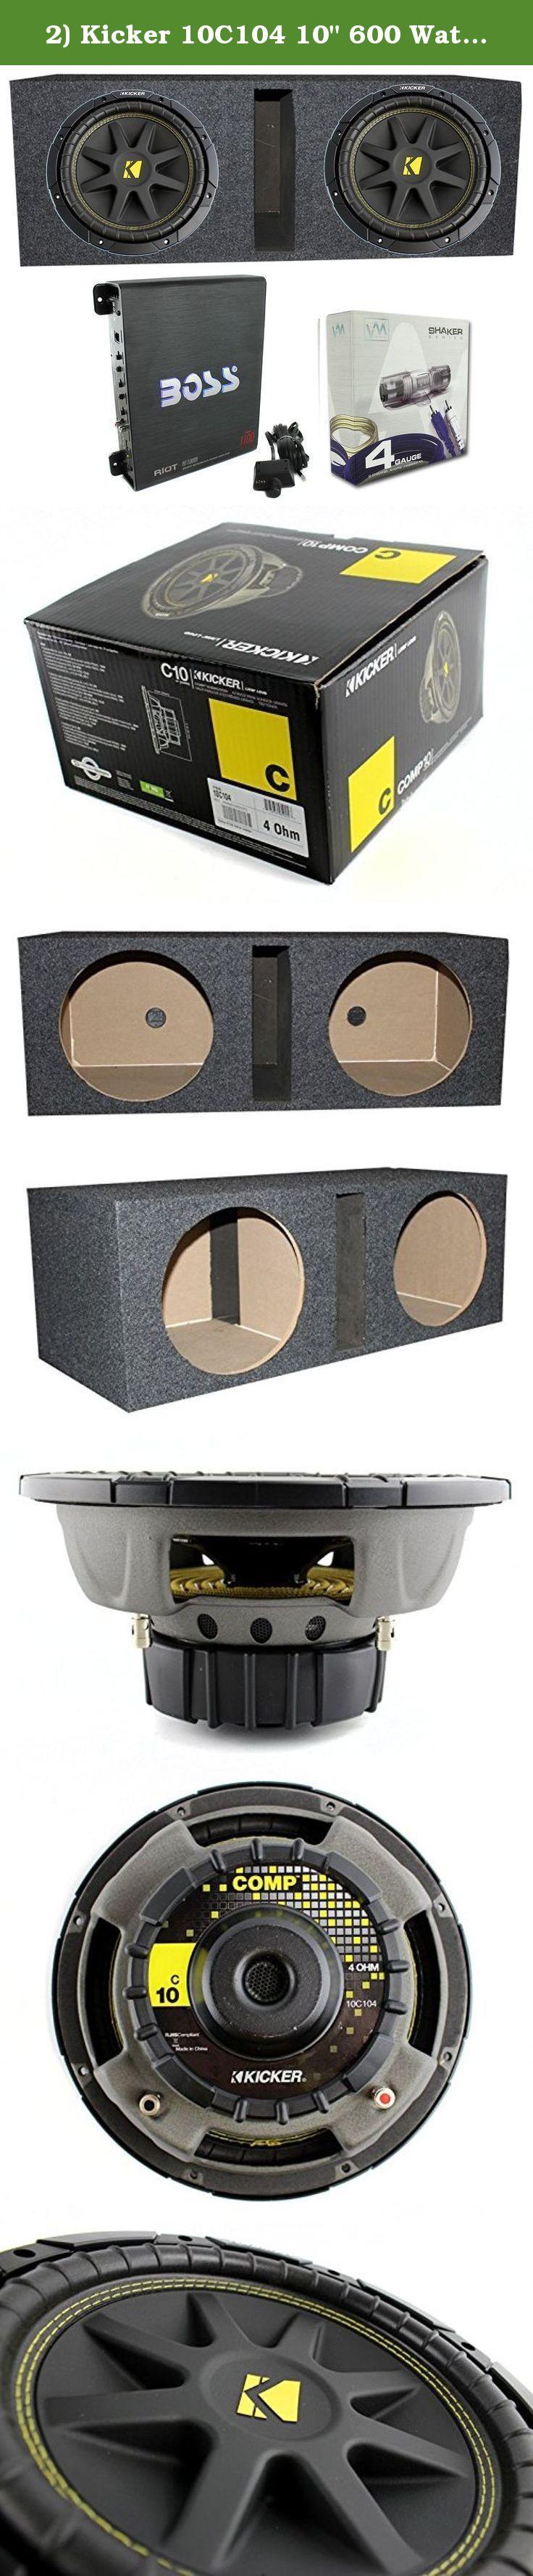 2 Kicker 10c104 10 600 Watt Car Subwoofers Box 1100w A Wiring Kits For Subs Amplifier